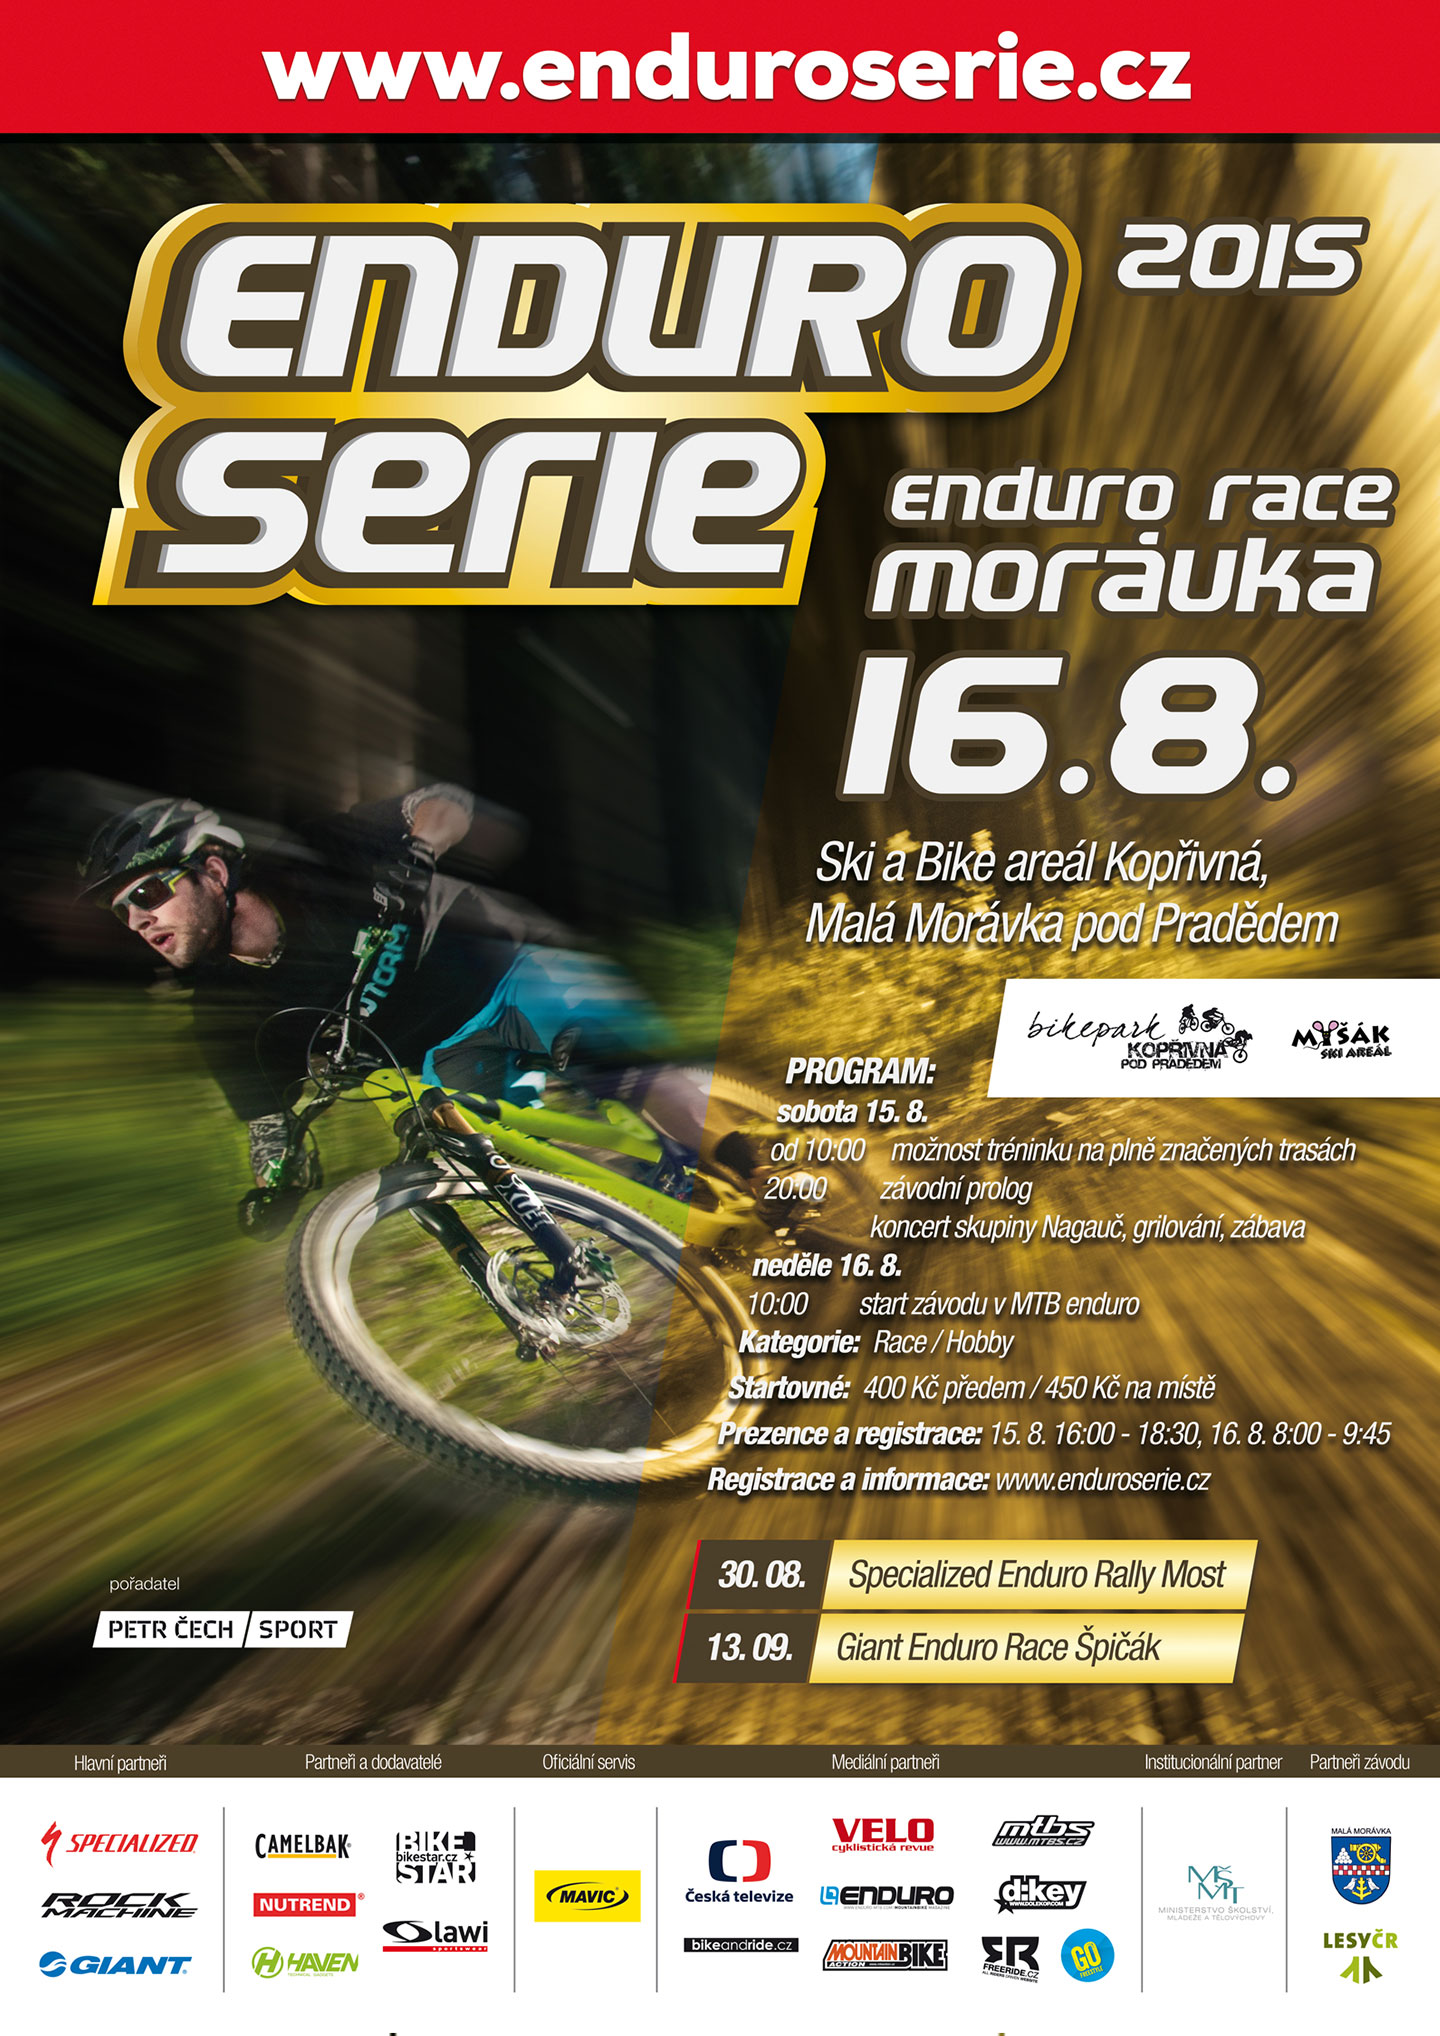 Enduro Serie 2015